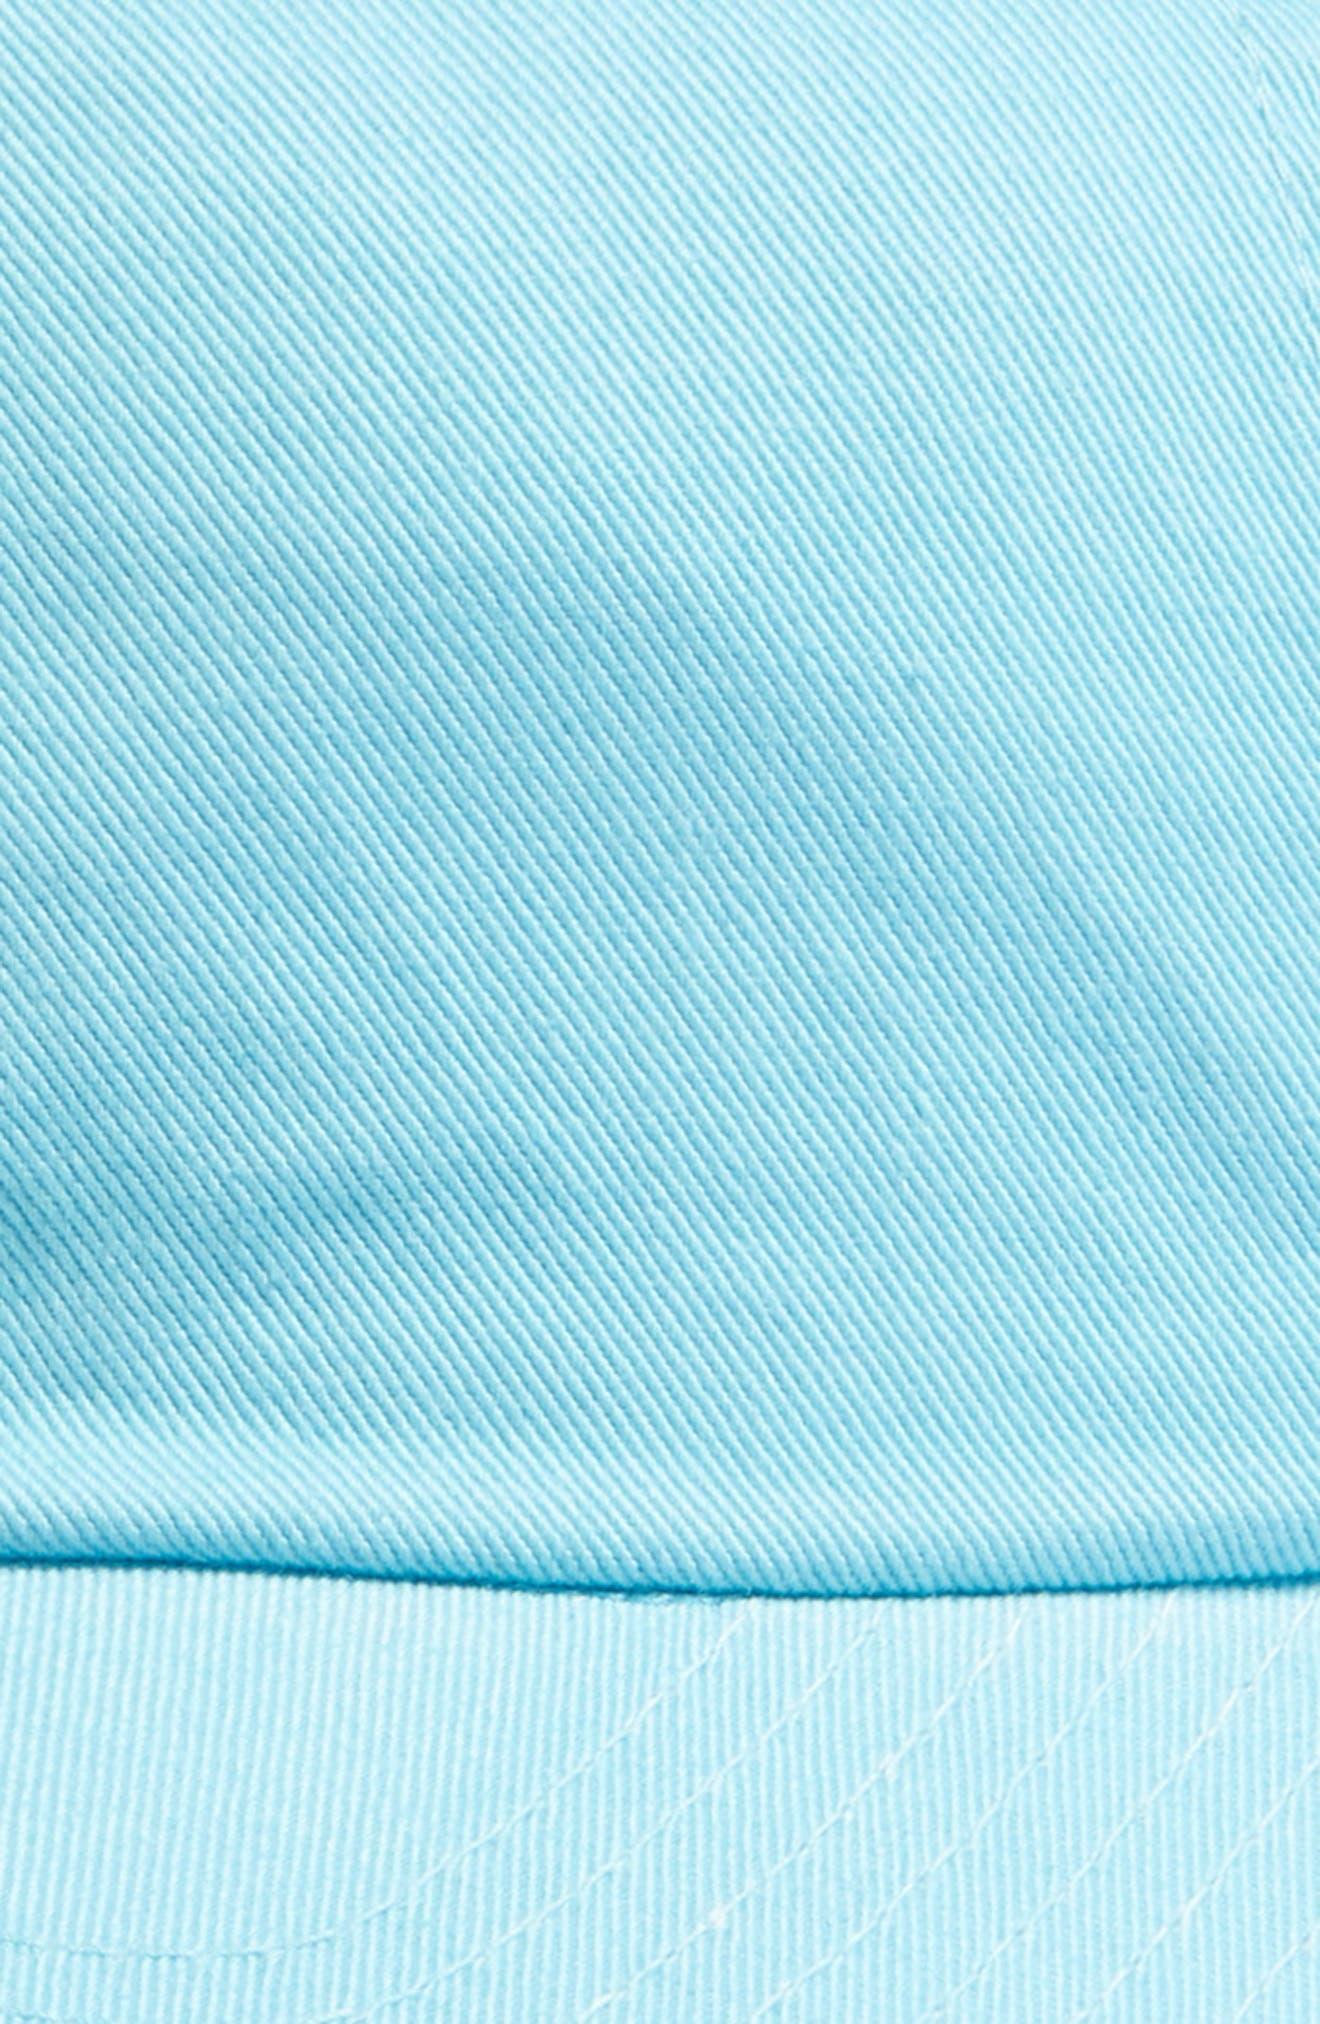 Washed Cotton Baseball Cap,                             Alternate thumbnail 3, color,                             Tropiques